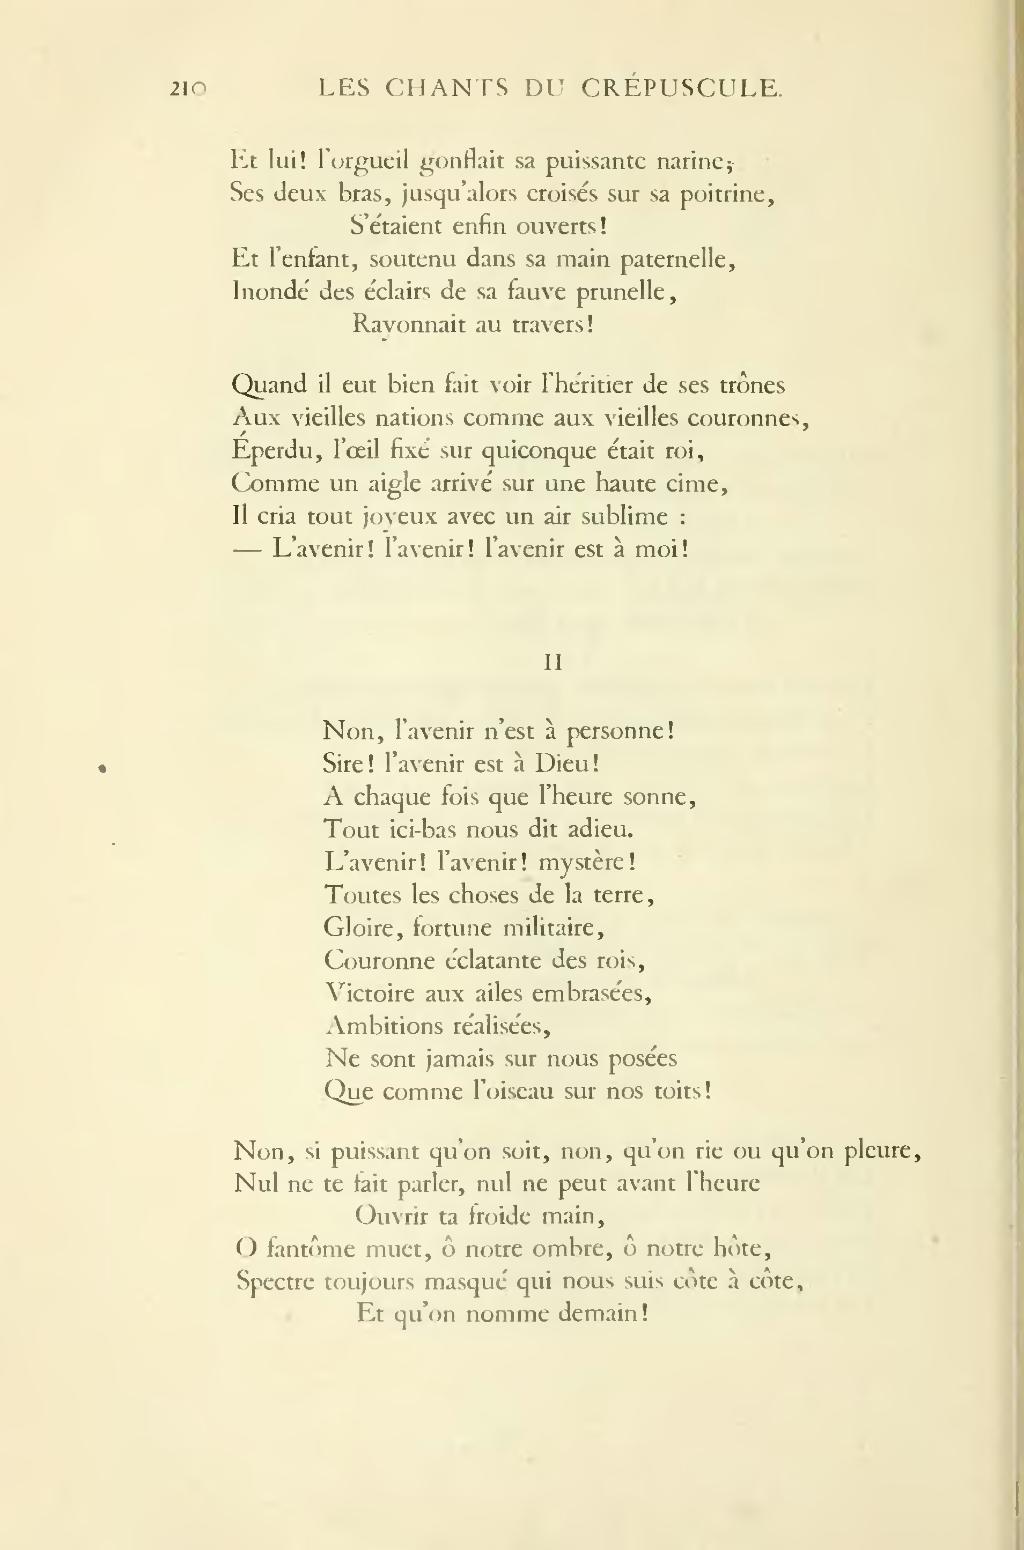 Page Hugo œuvres Completes Impr Nat Poesie Tome Ii Djvu 222